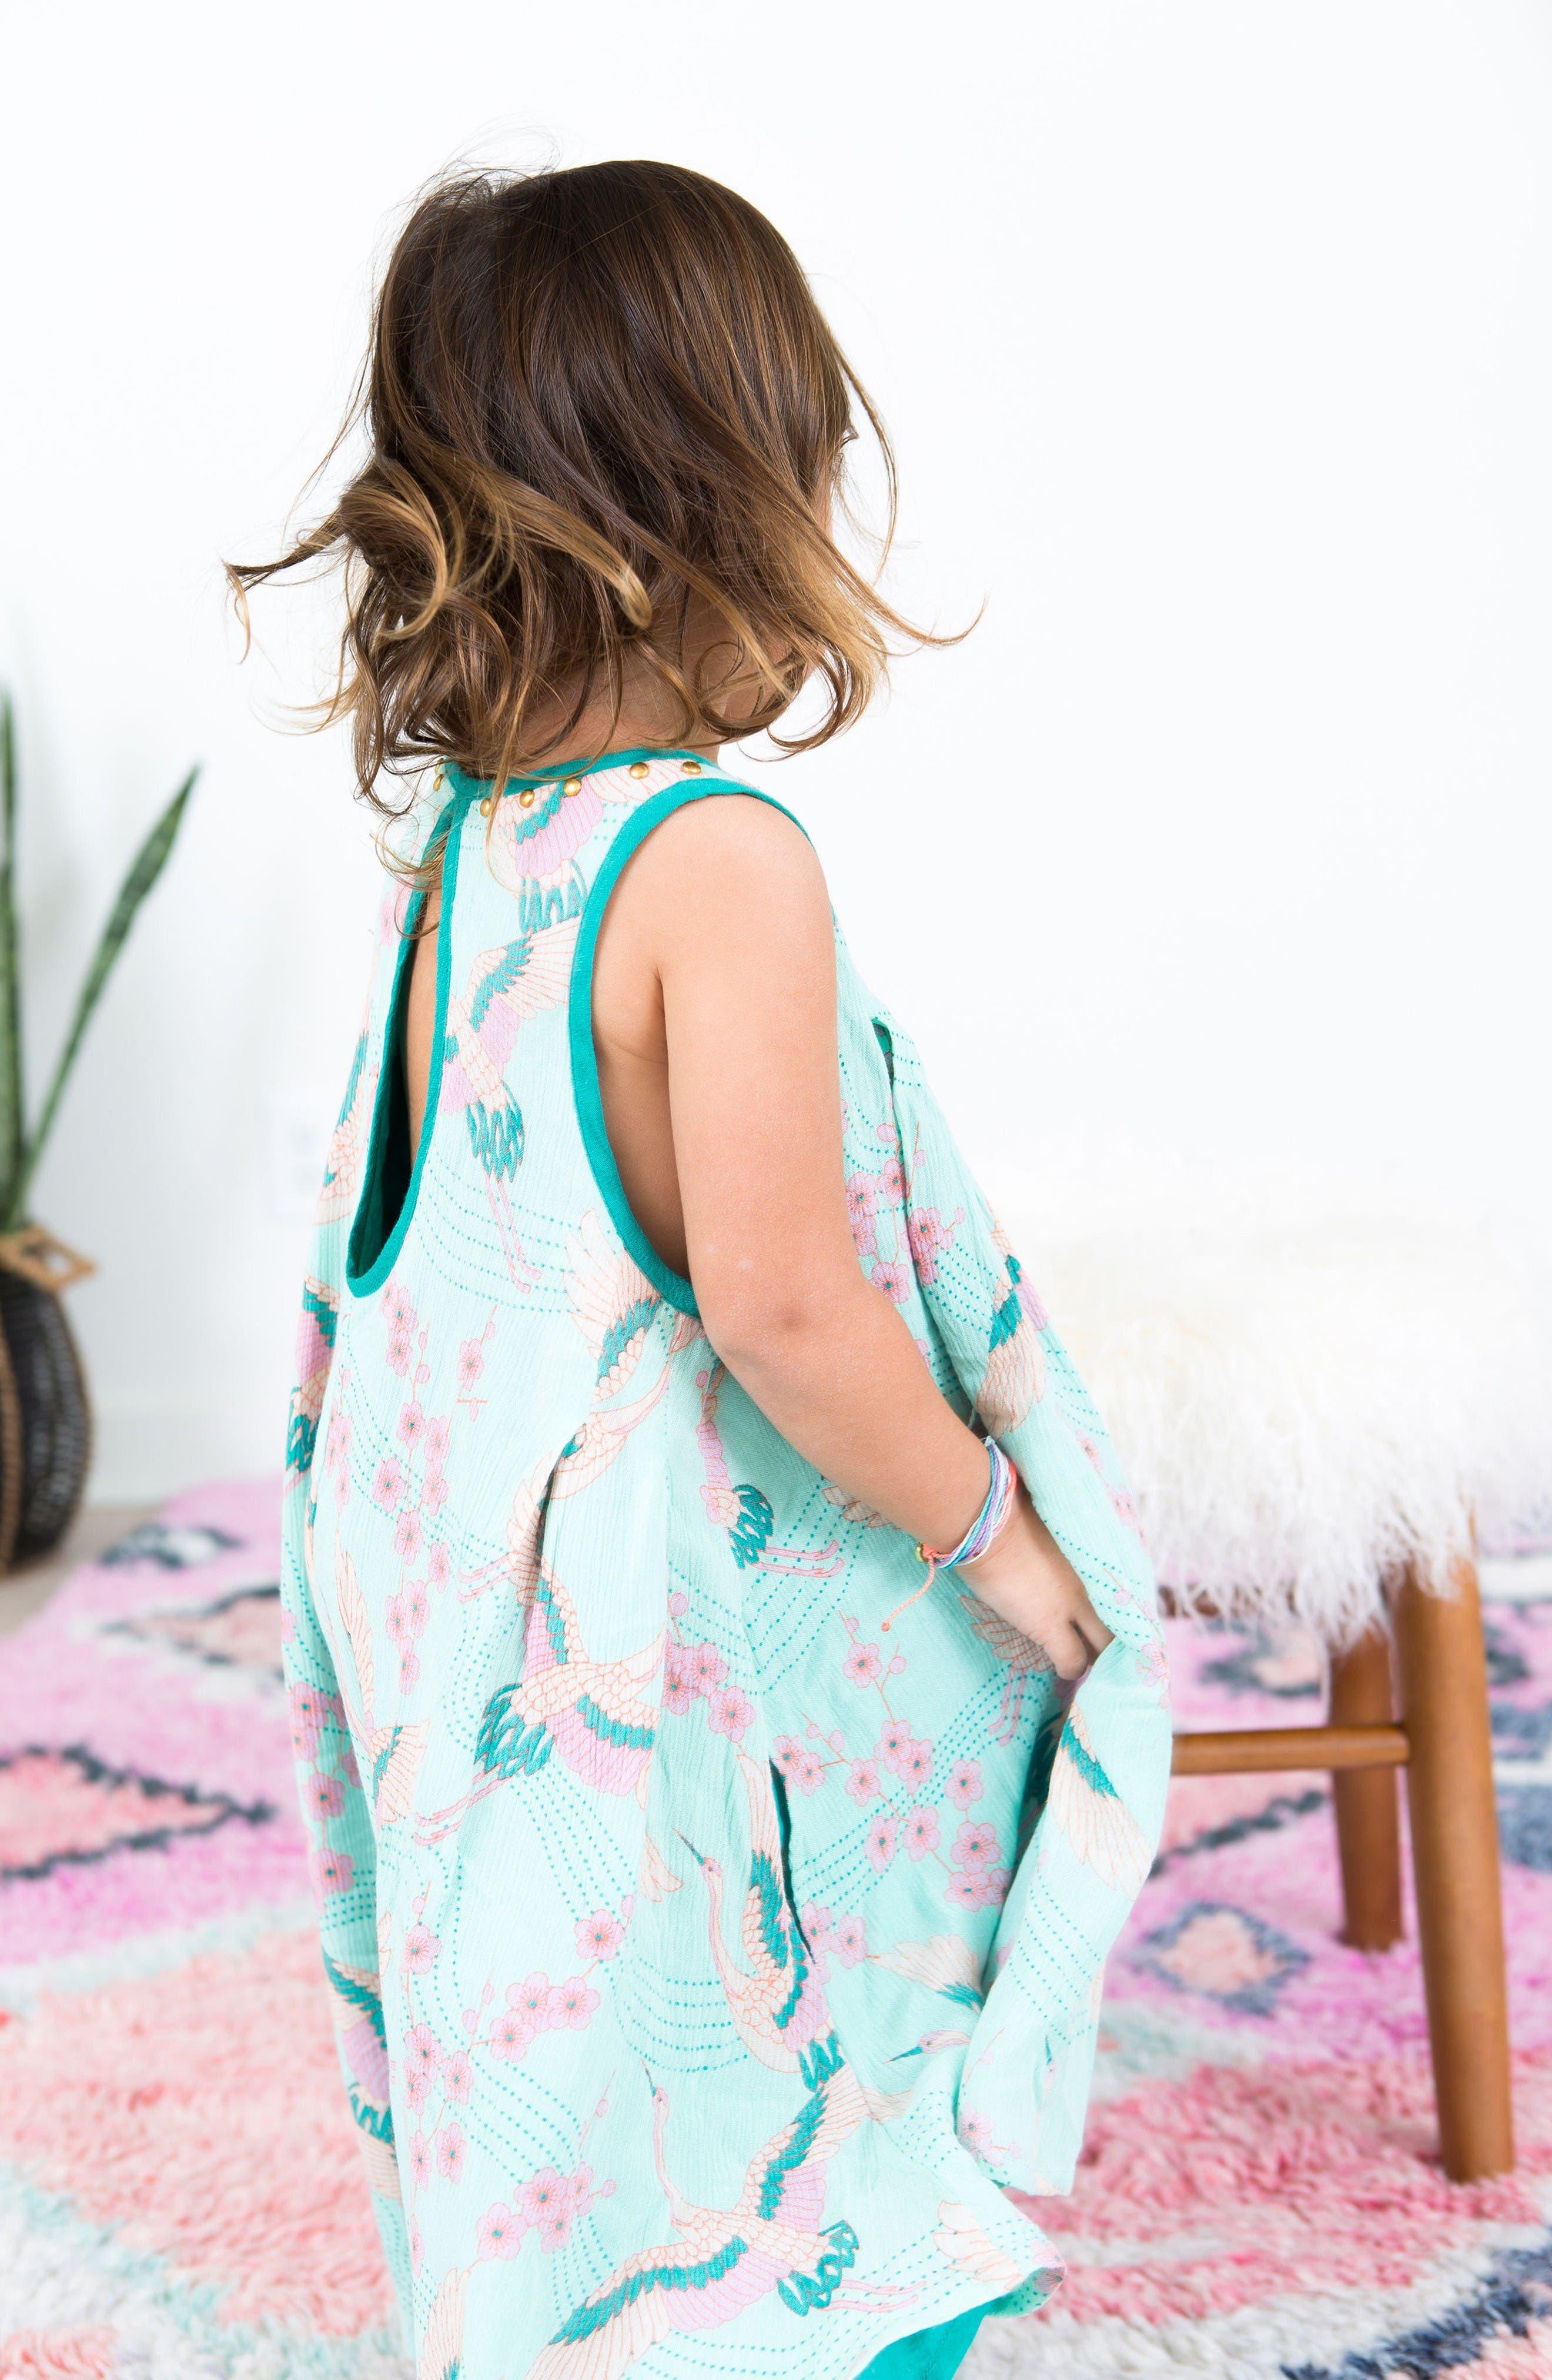 Alternate Image 2  - BOWIE X JAMES Print Trapeze Dress (Toddler Girls, Little Girls & Big Girls)